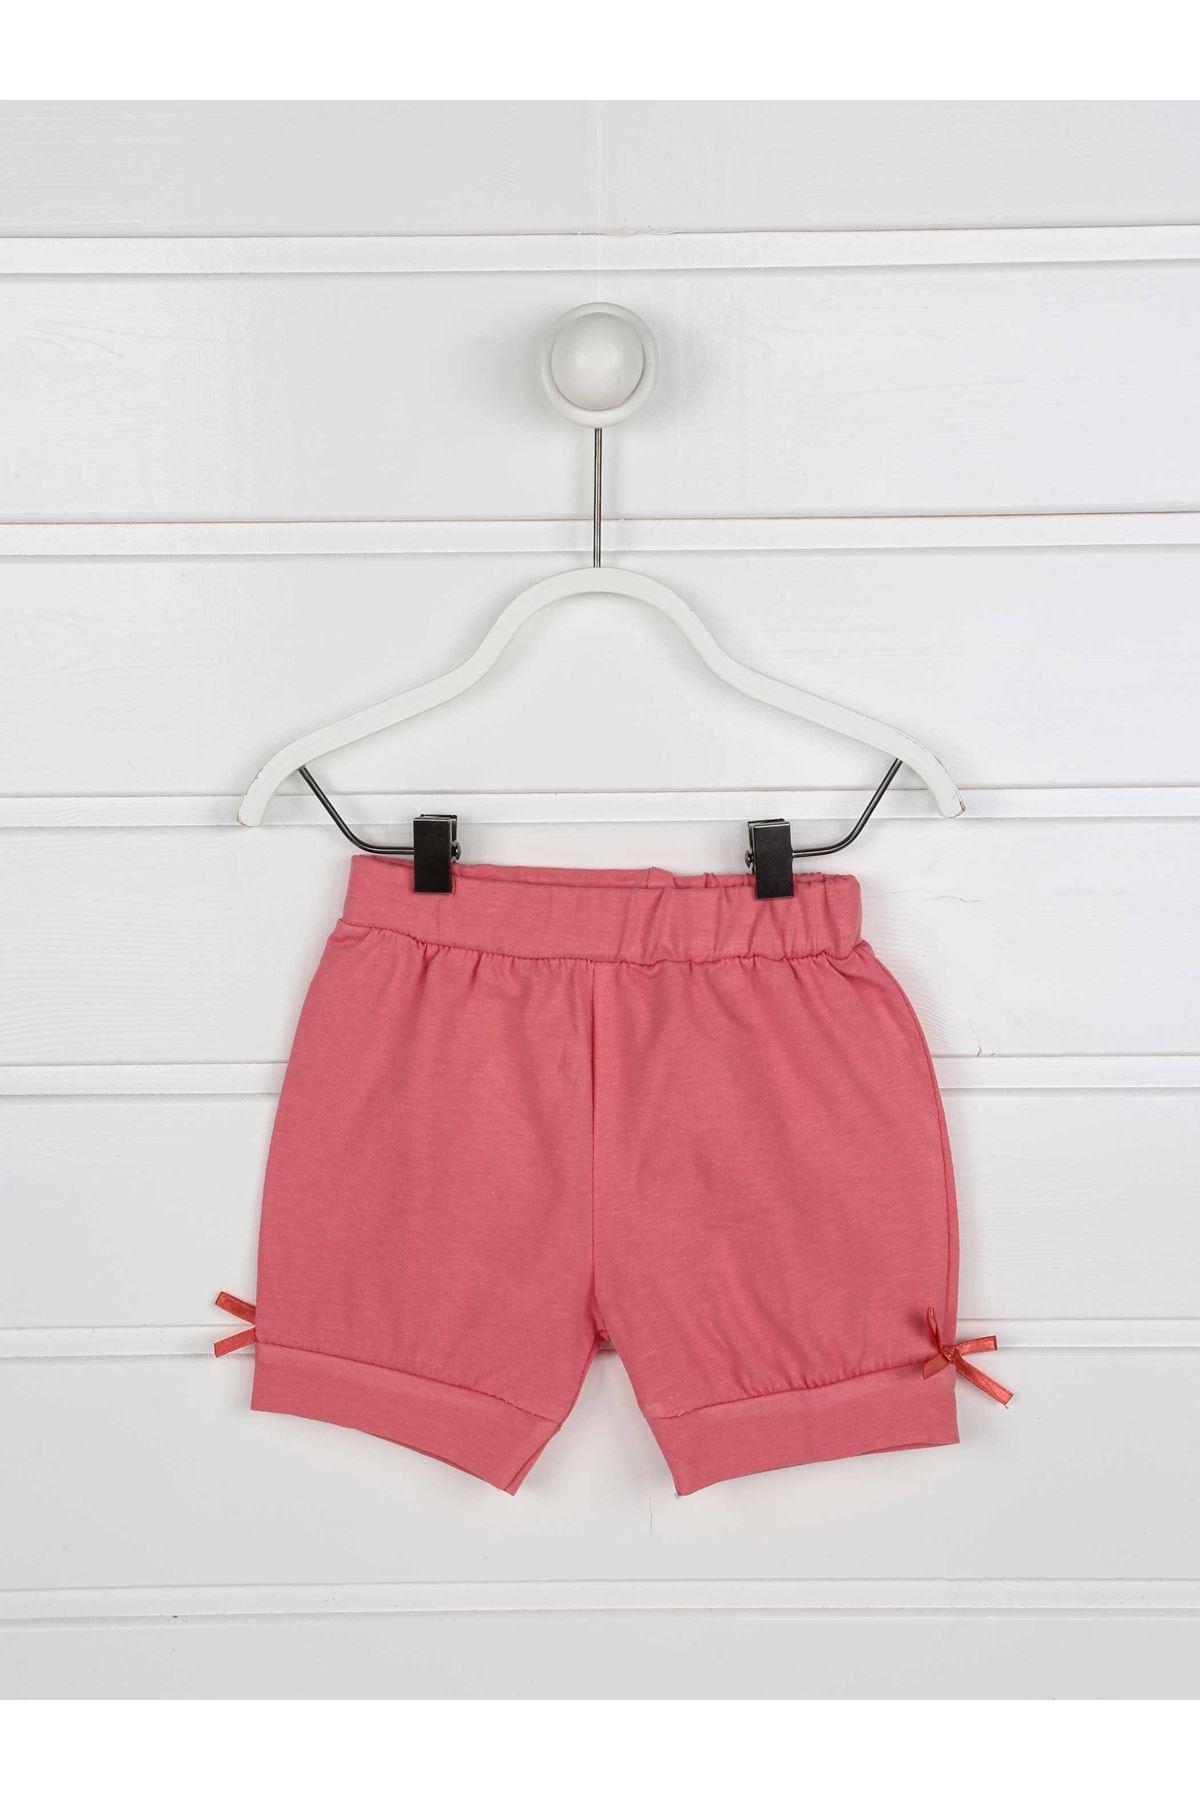 Grenadine red Summer baby girl set bottom tights t-shirt 2 pieces bottom top babies cotton seasonal models